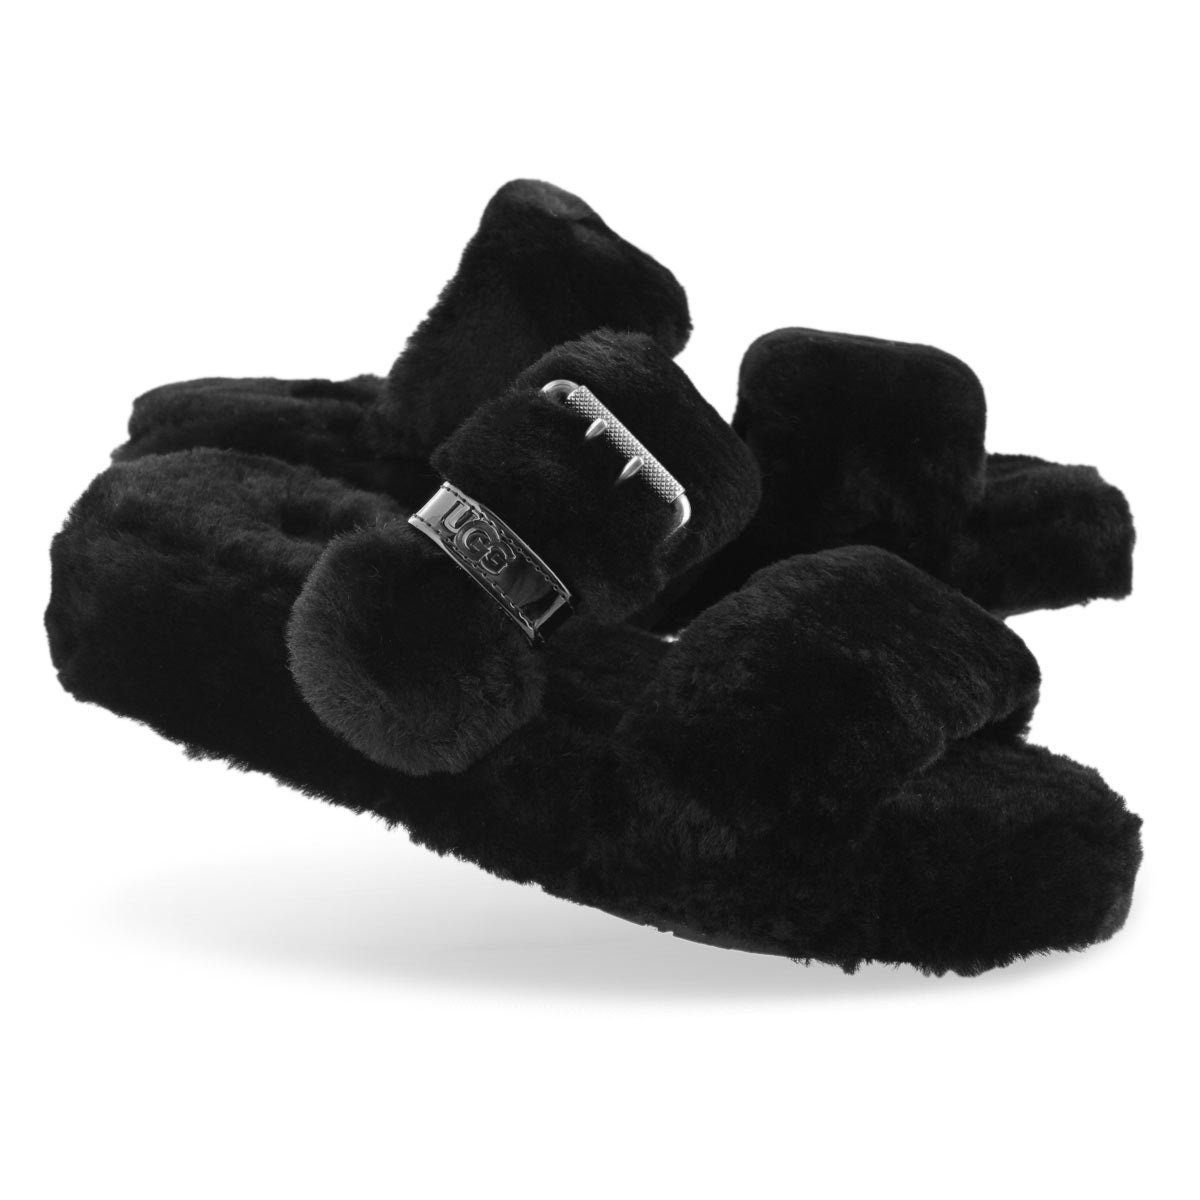 Lds Fuzz Yeah black sheepskin slipper